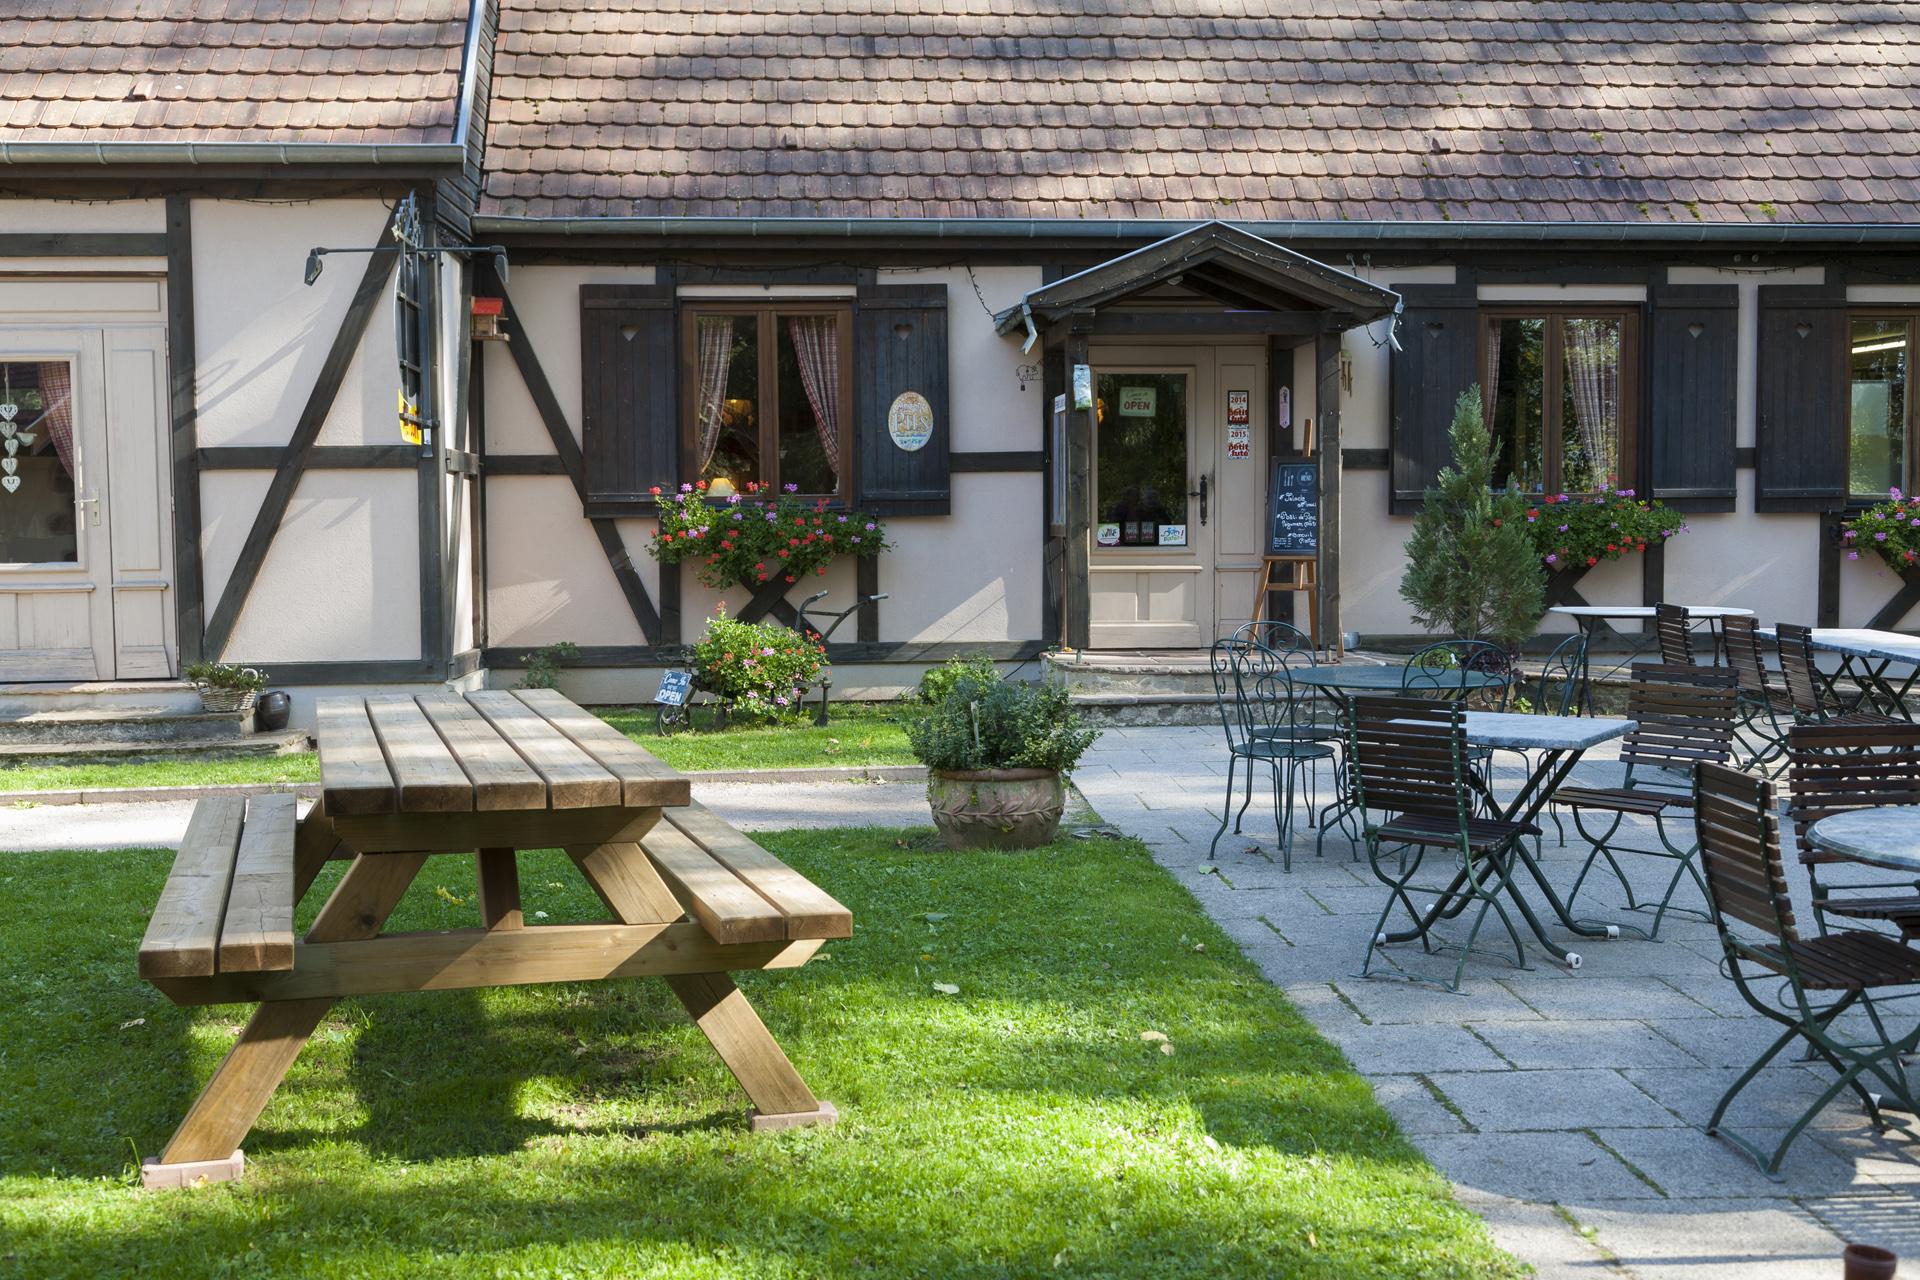 Restaurant Le Sauloch - ©Panoramaweb